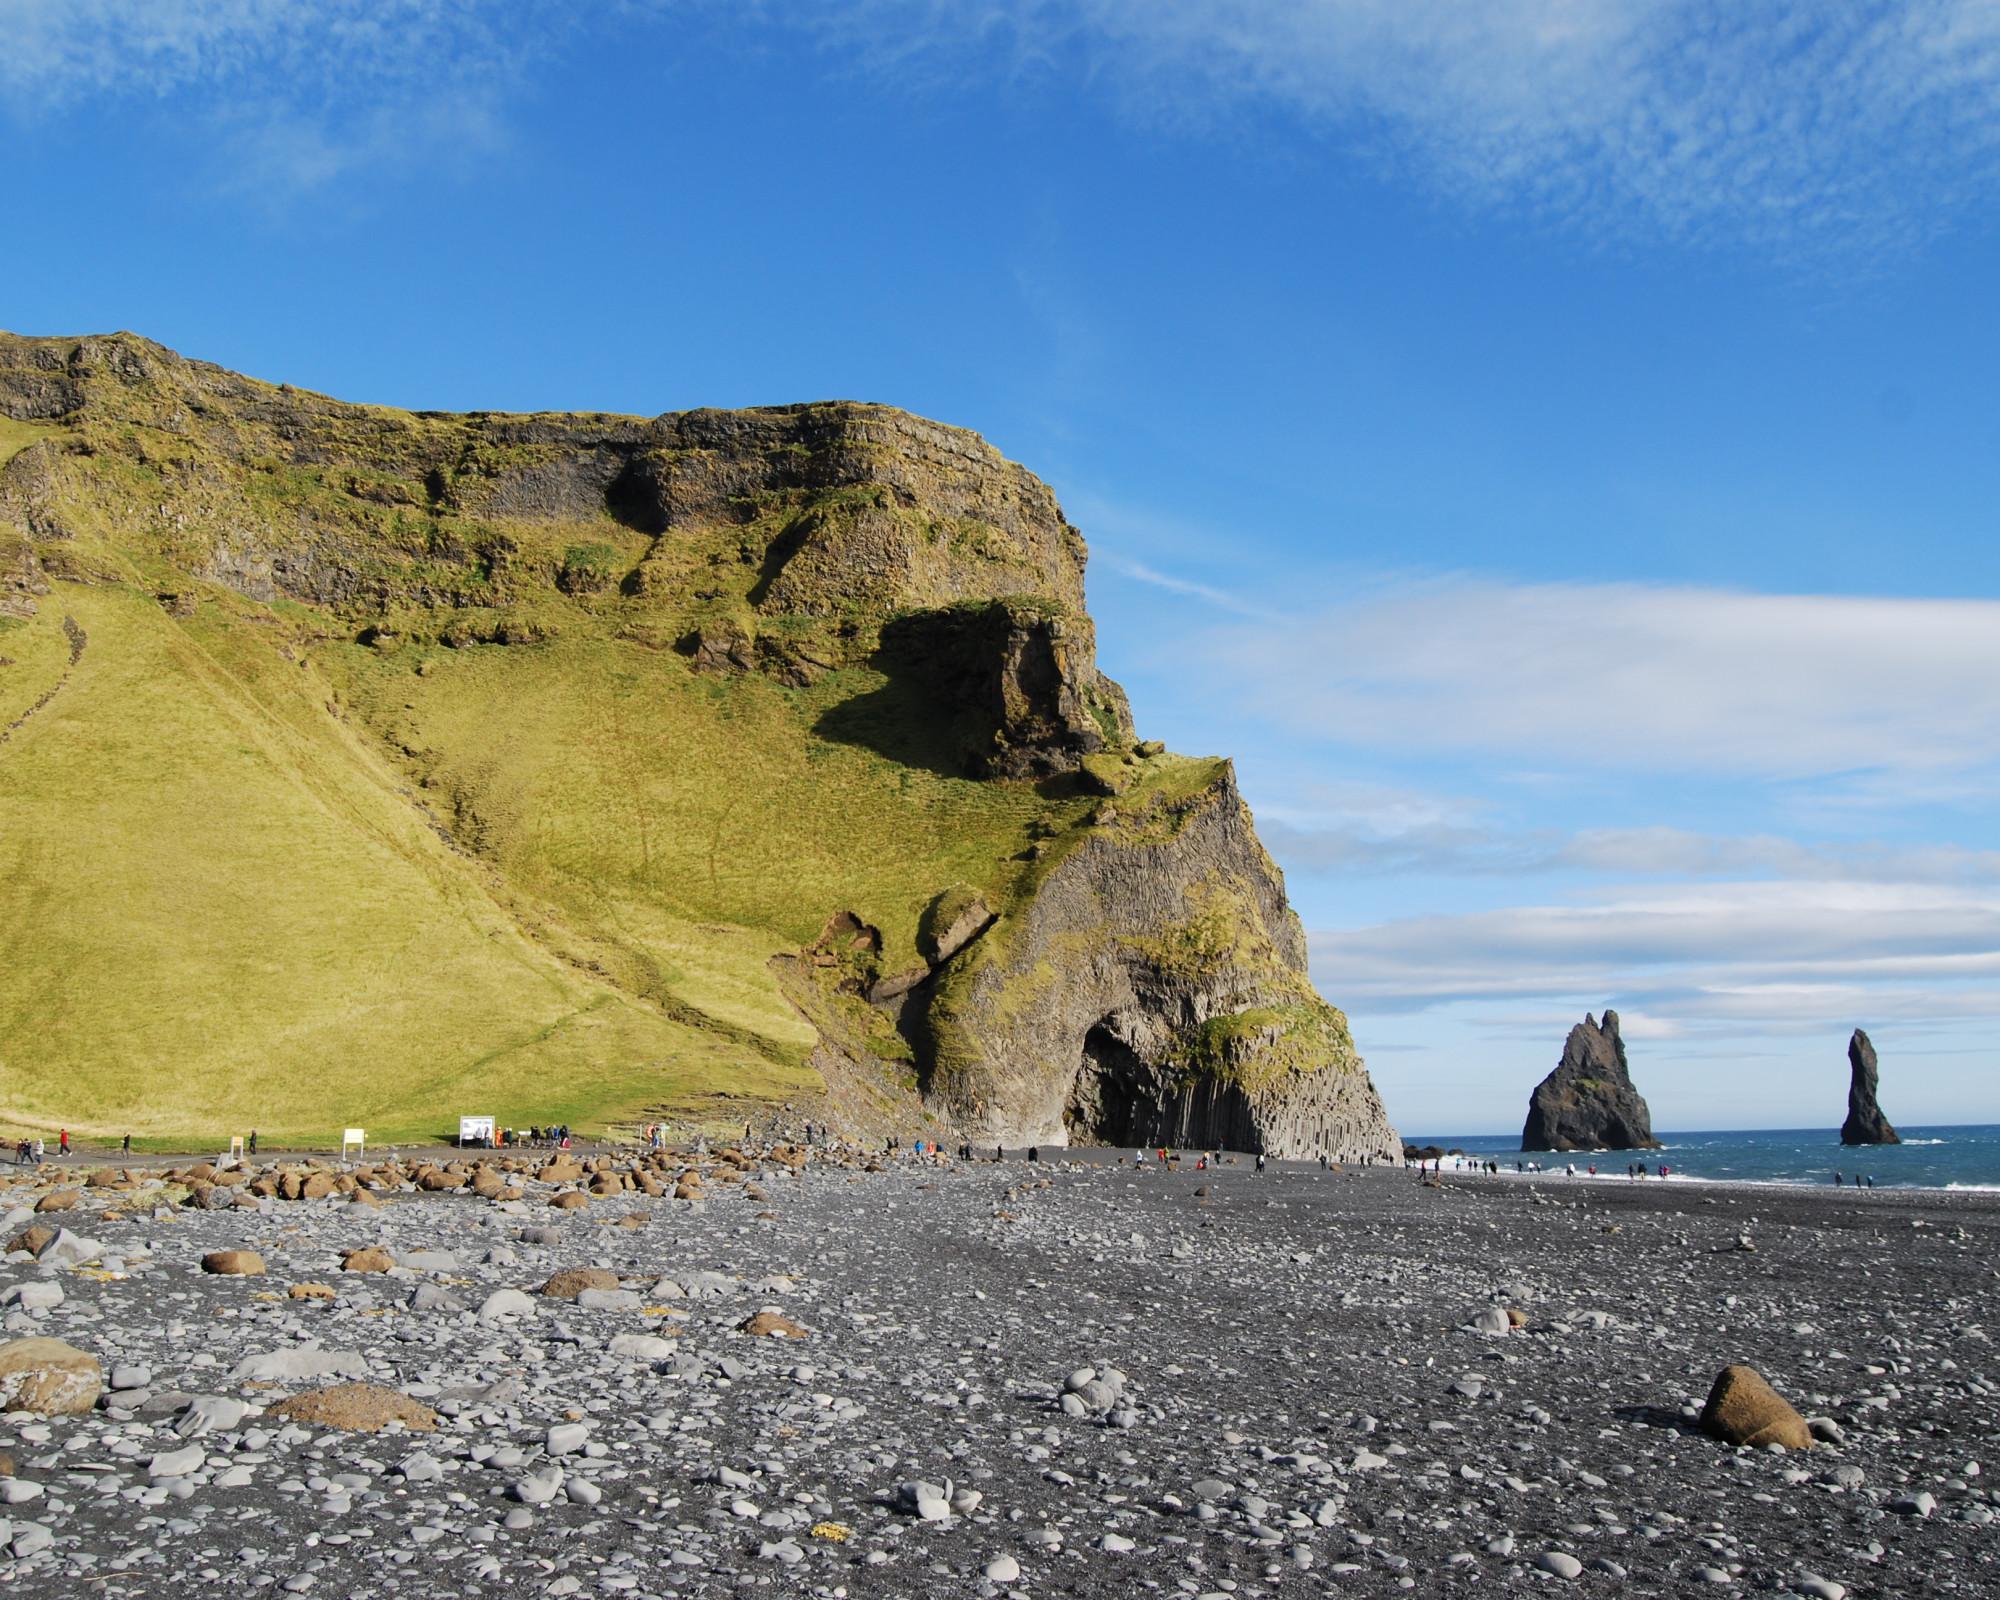 Photo 2: Reynisdrangar, au bord de l'océan